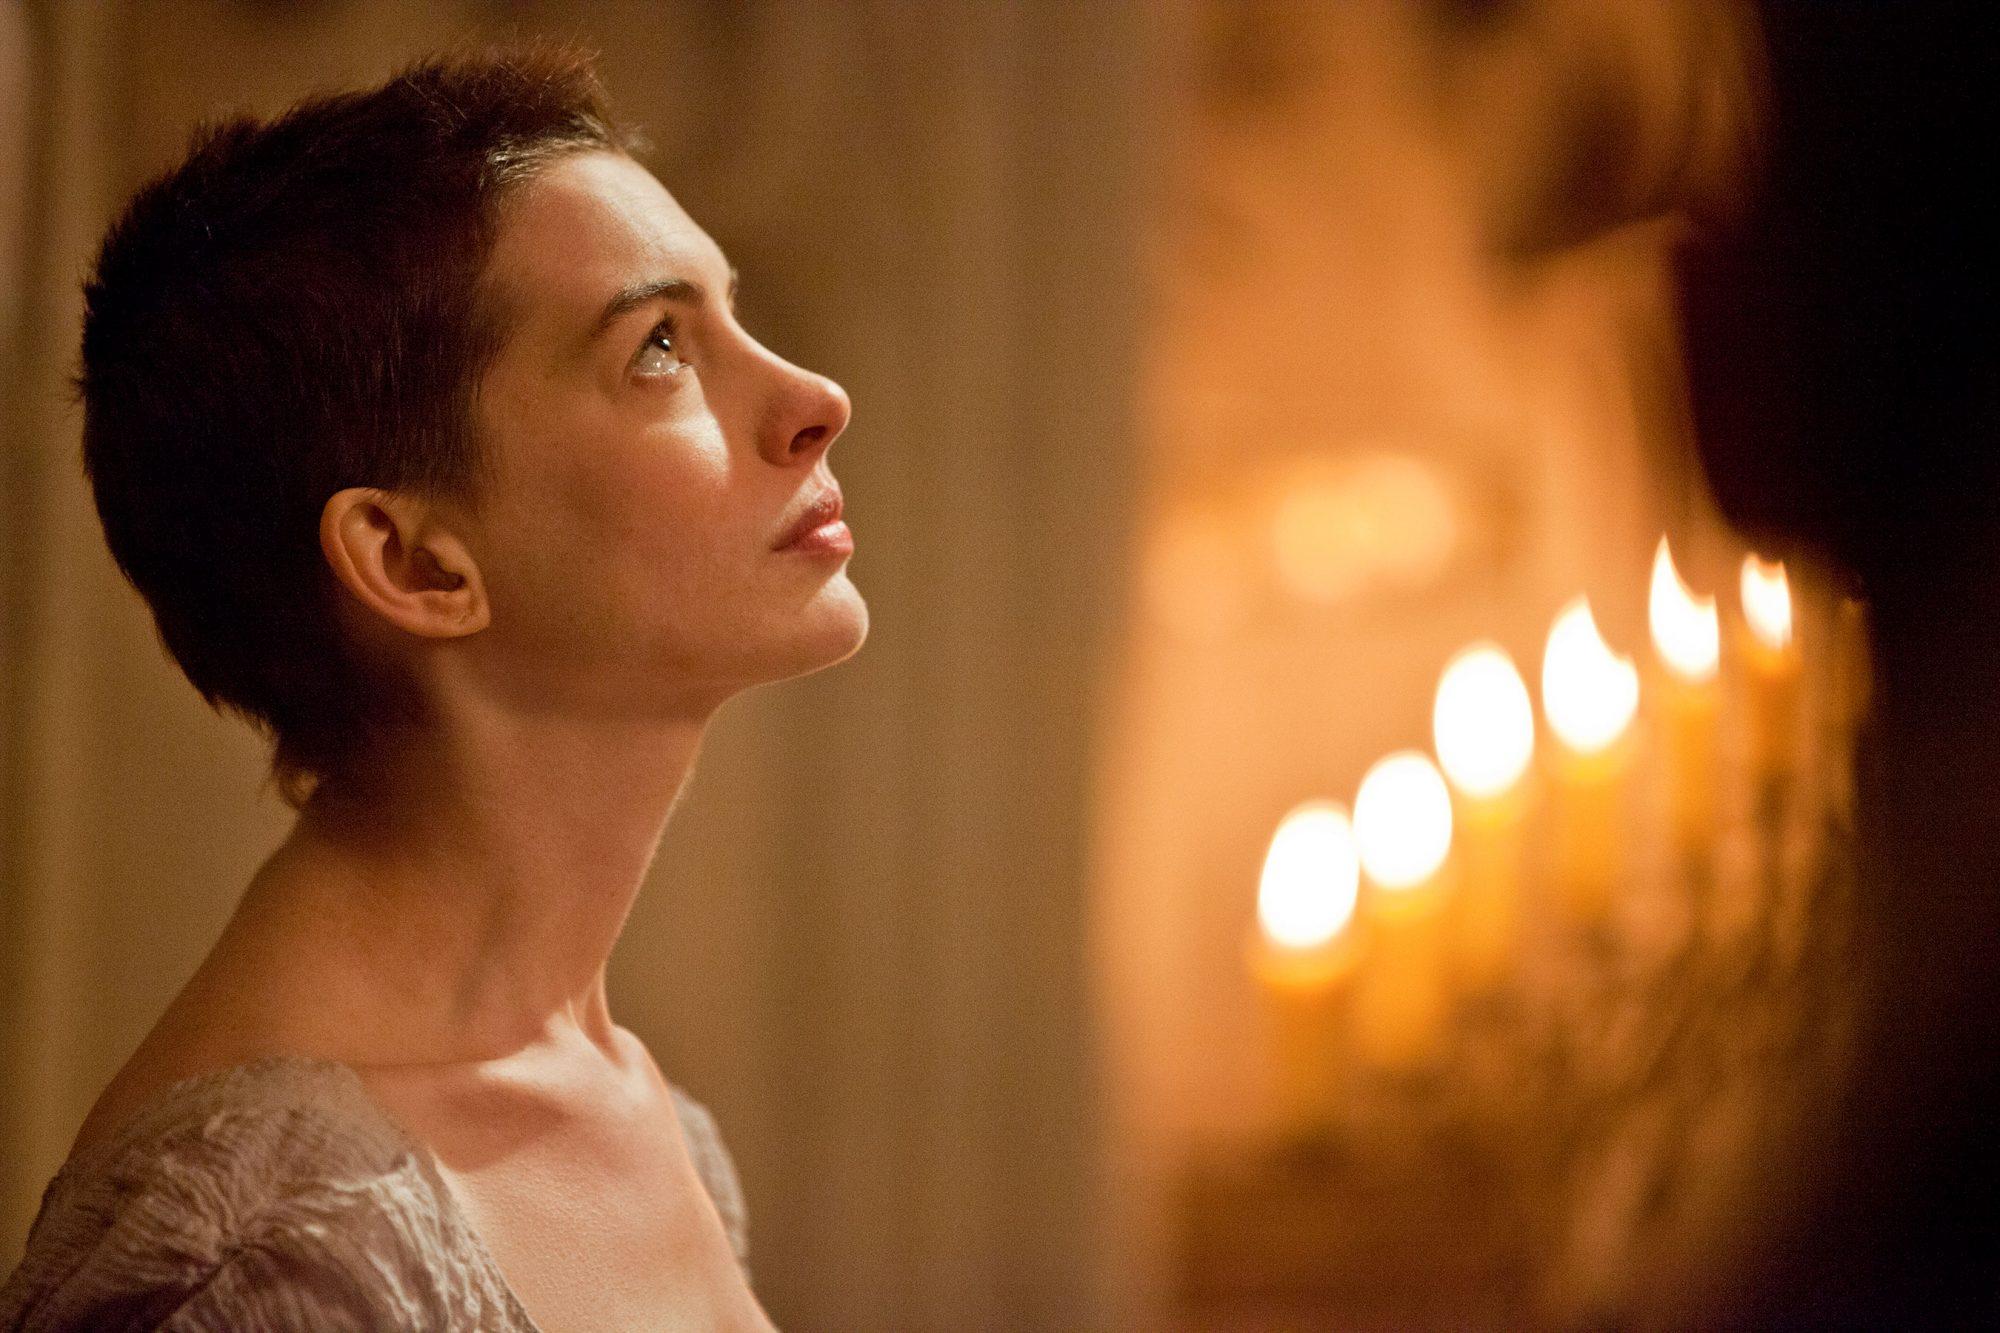 Les Miserables (2012)Anne Hathaway